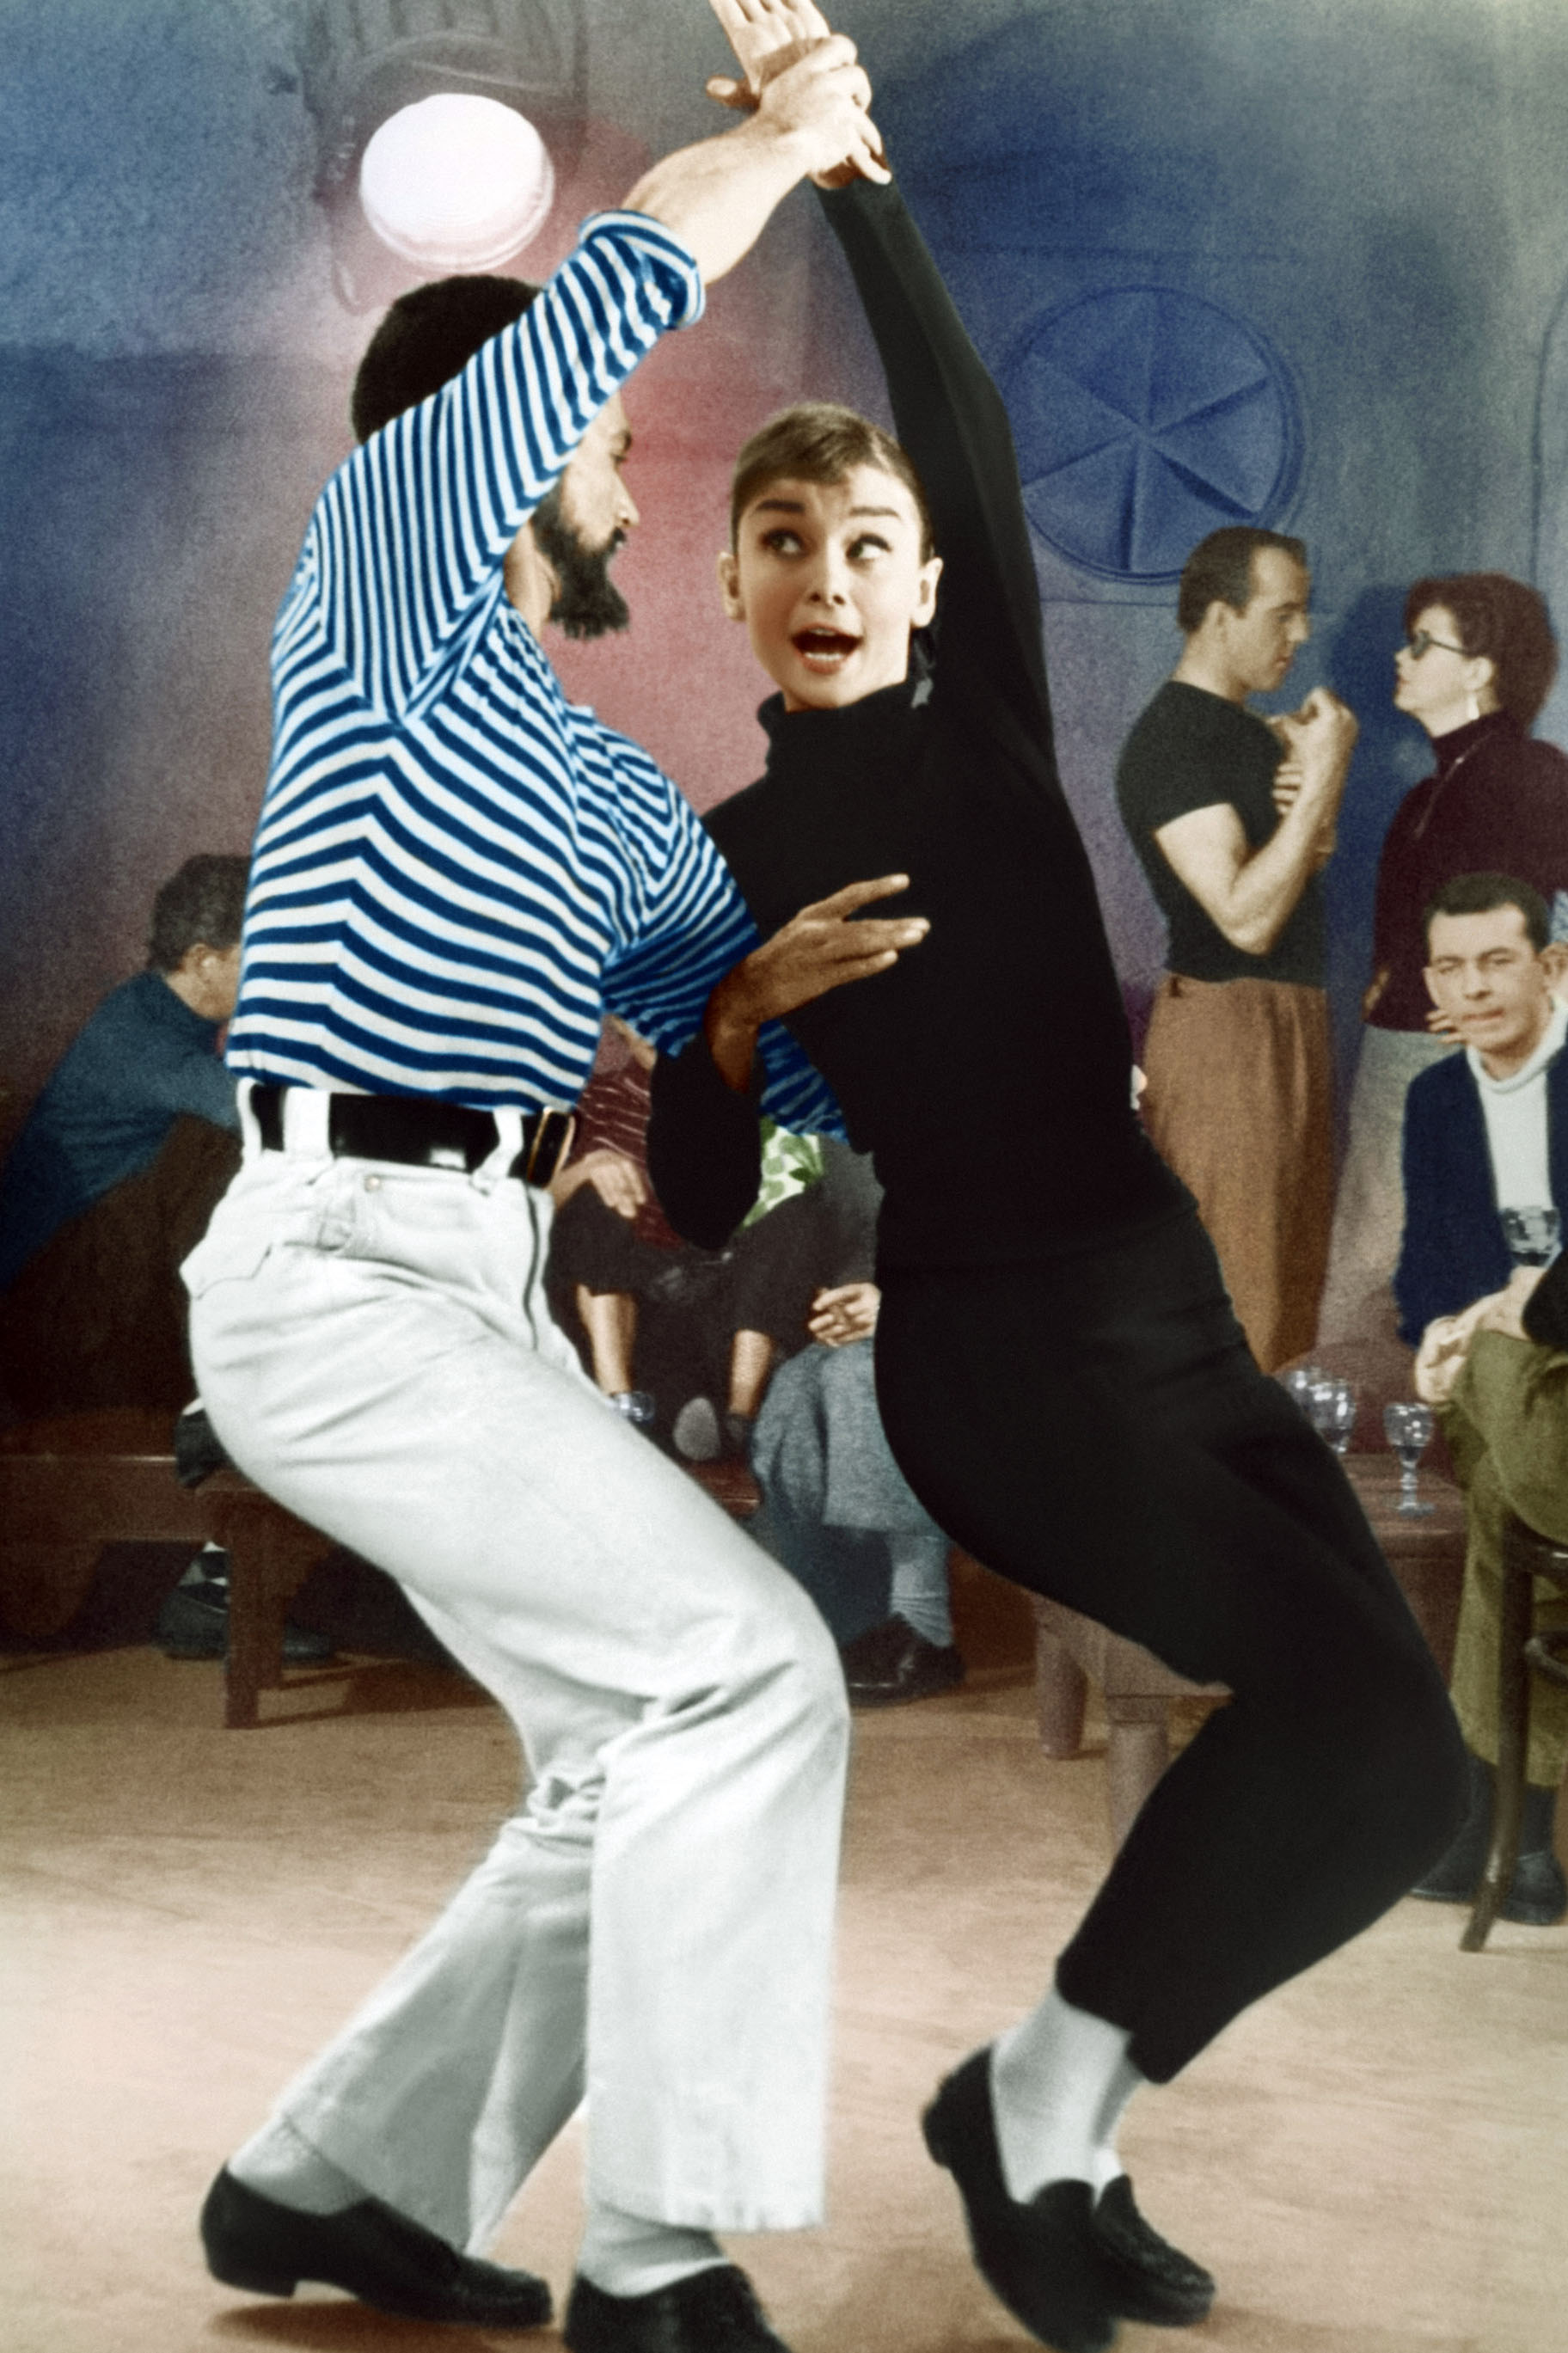 Audrey Hepburn in 'Funny Face', 1957.